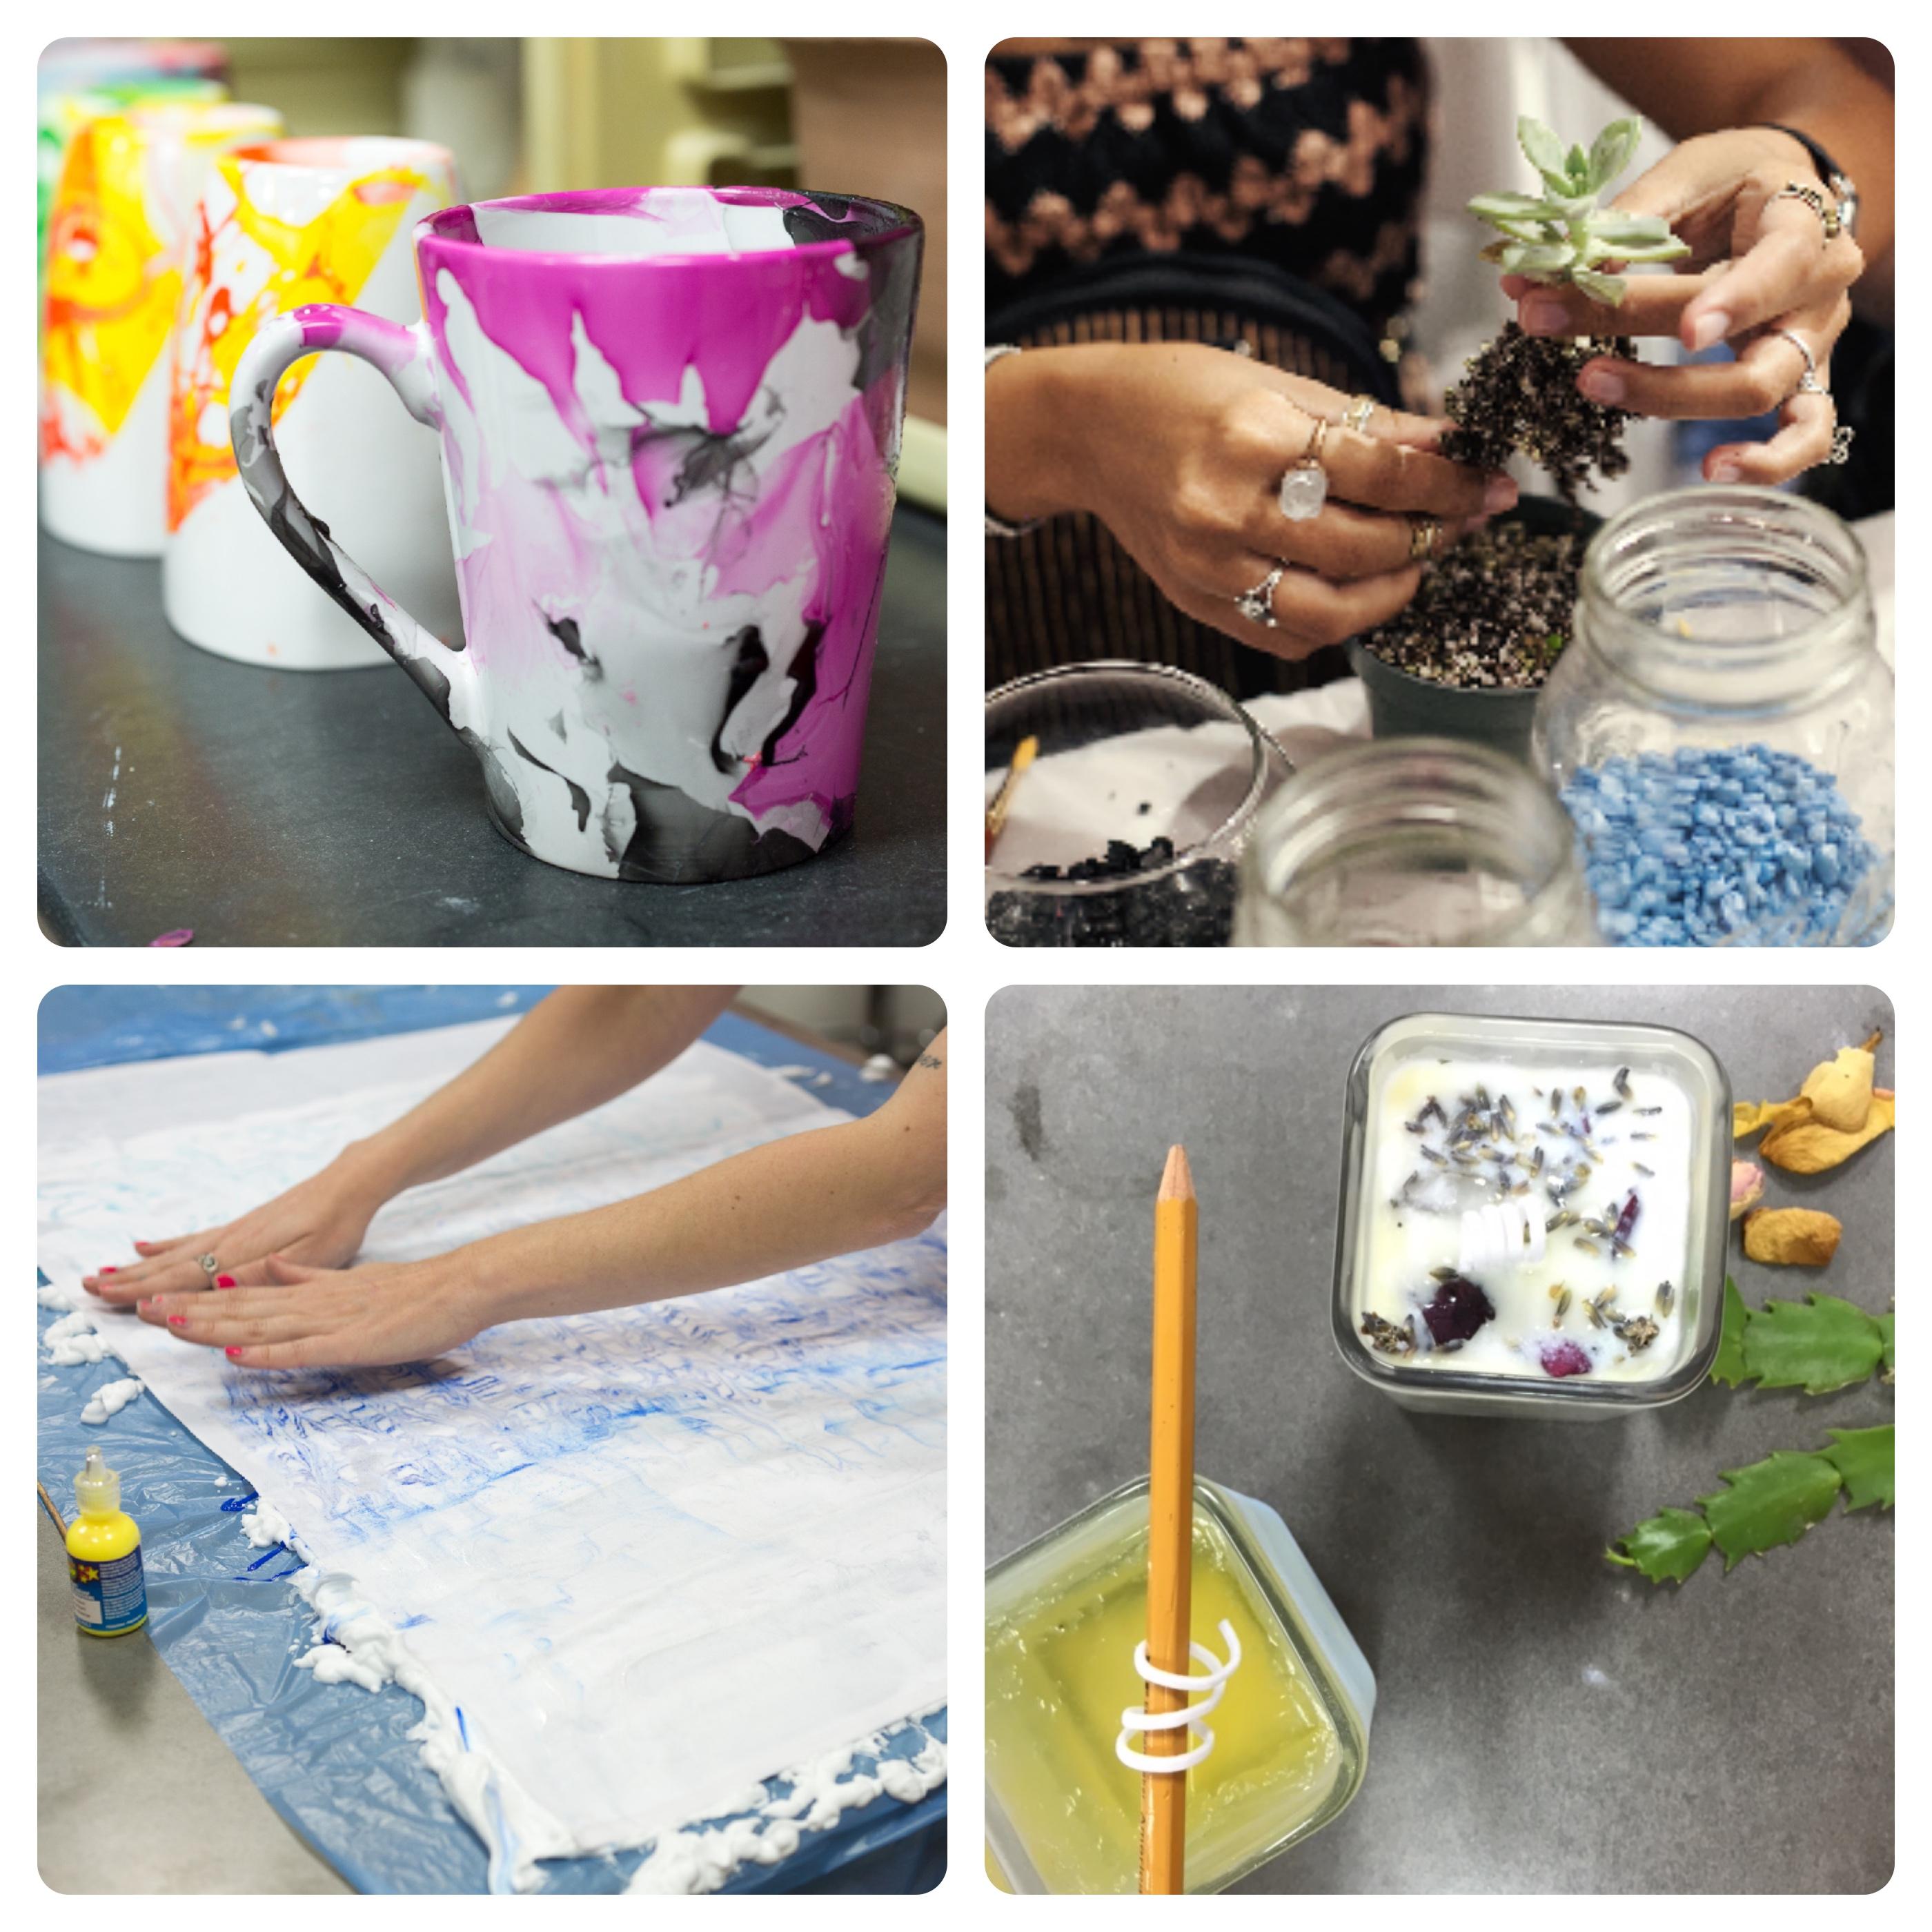 Shop America shrinky dink workshop | craft classes houston | pop shop america